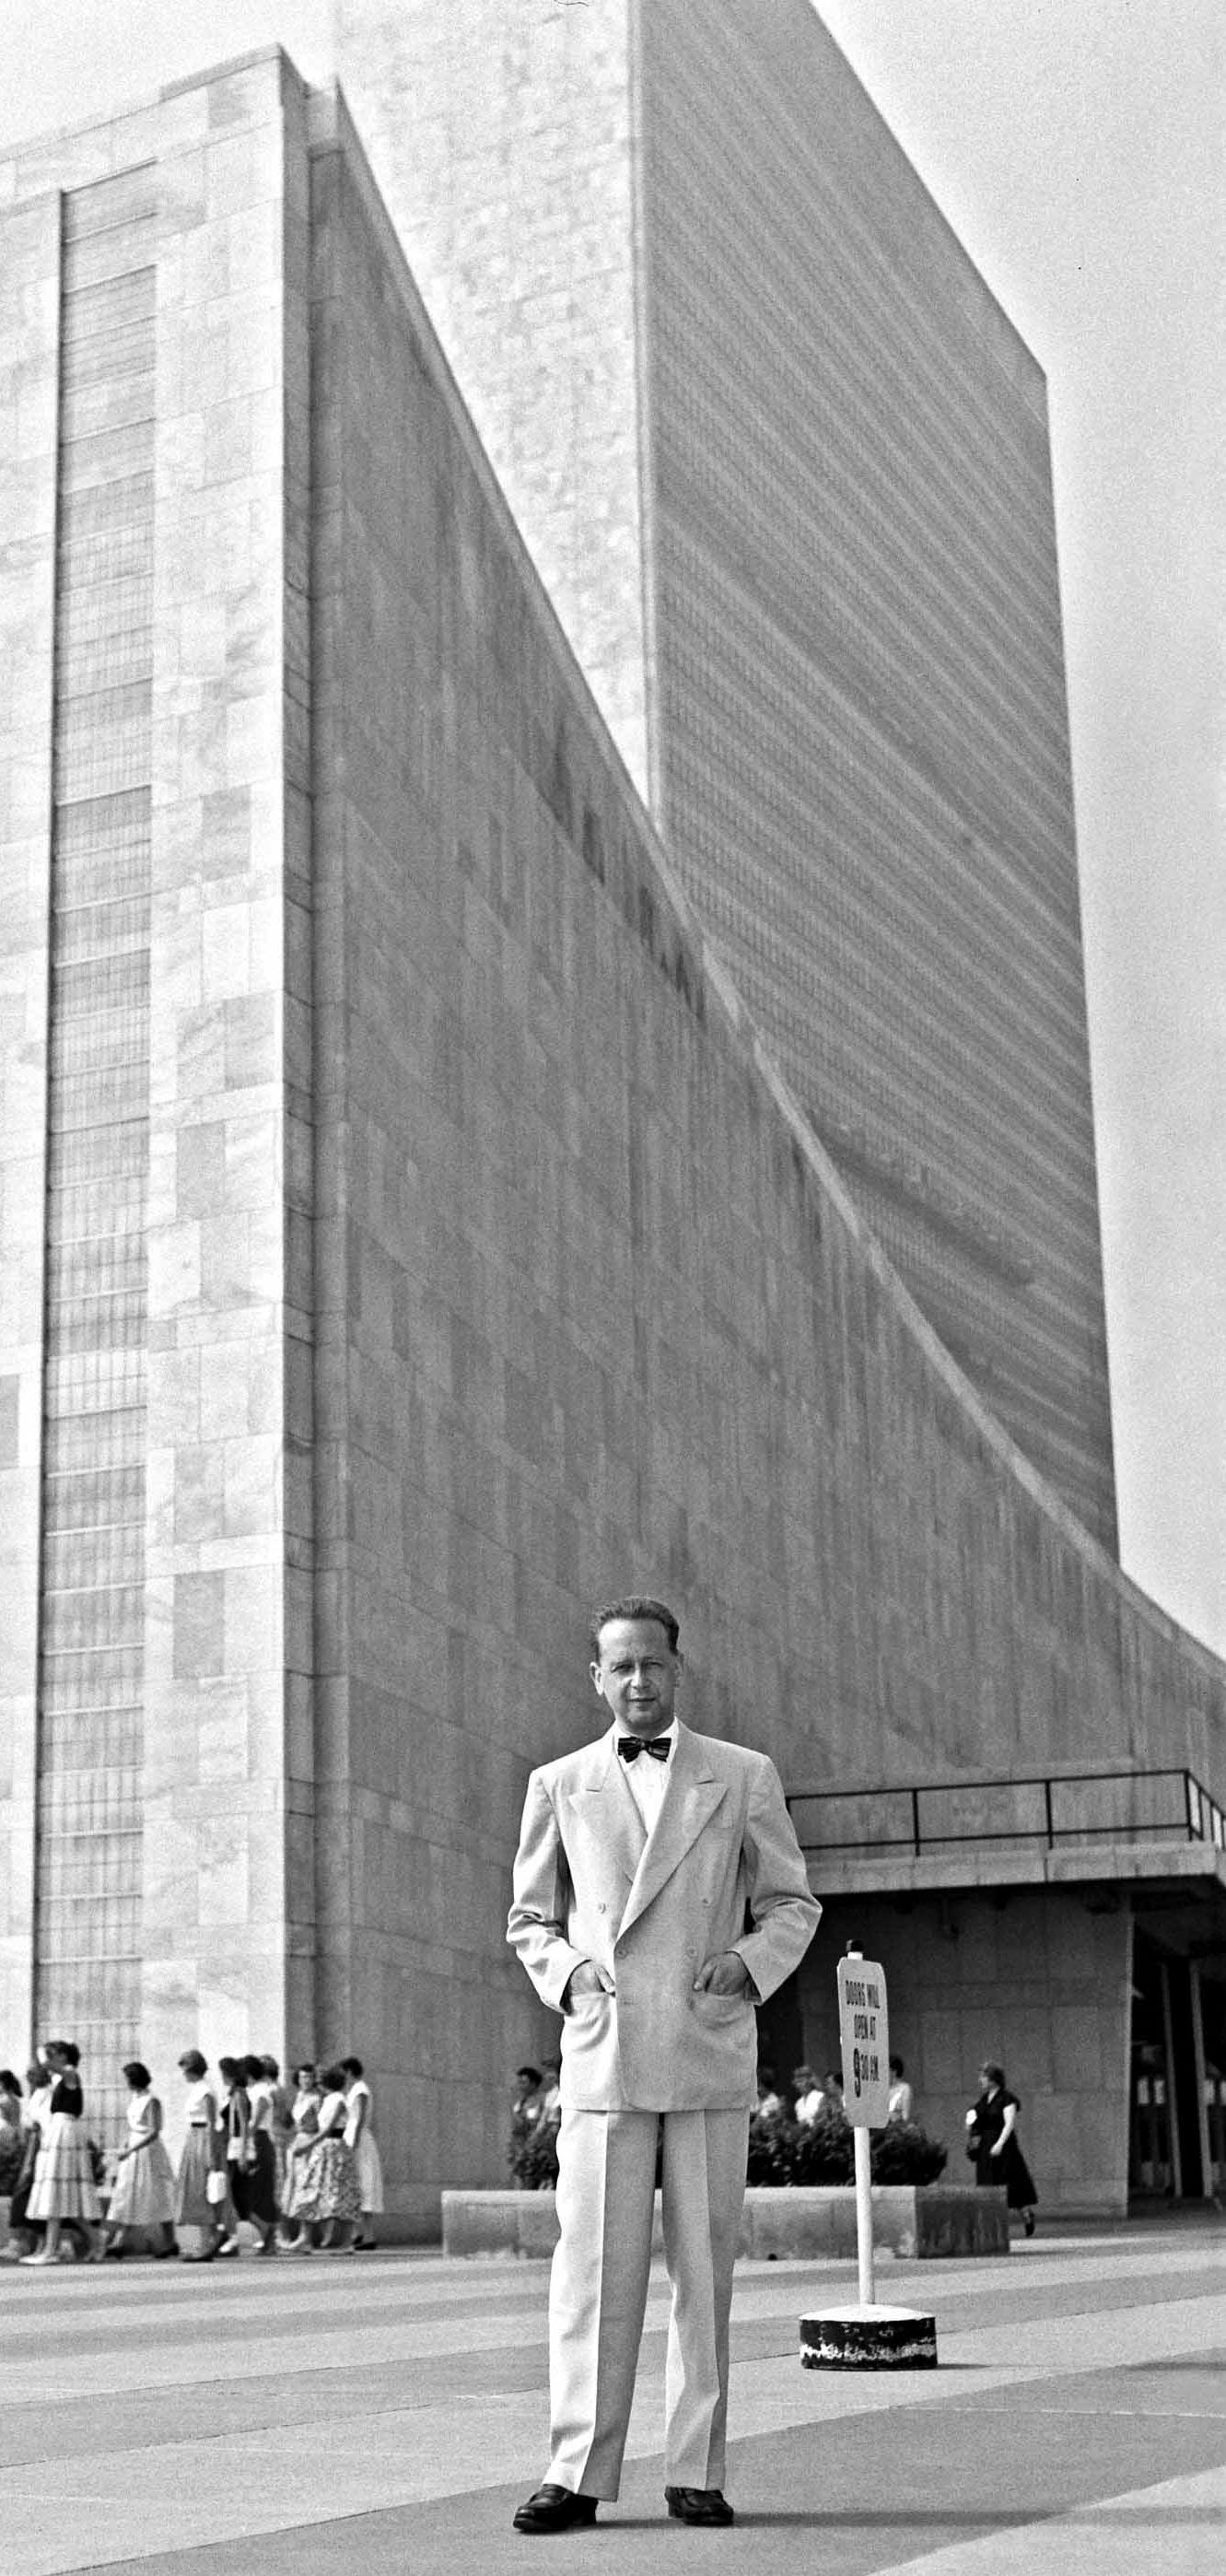 FileDag Hammarskjold Outside The UN Building 2